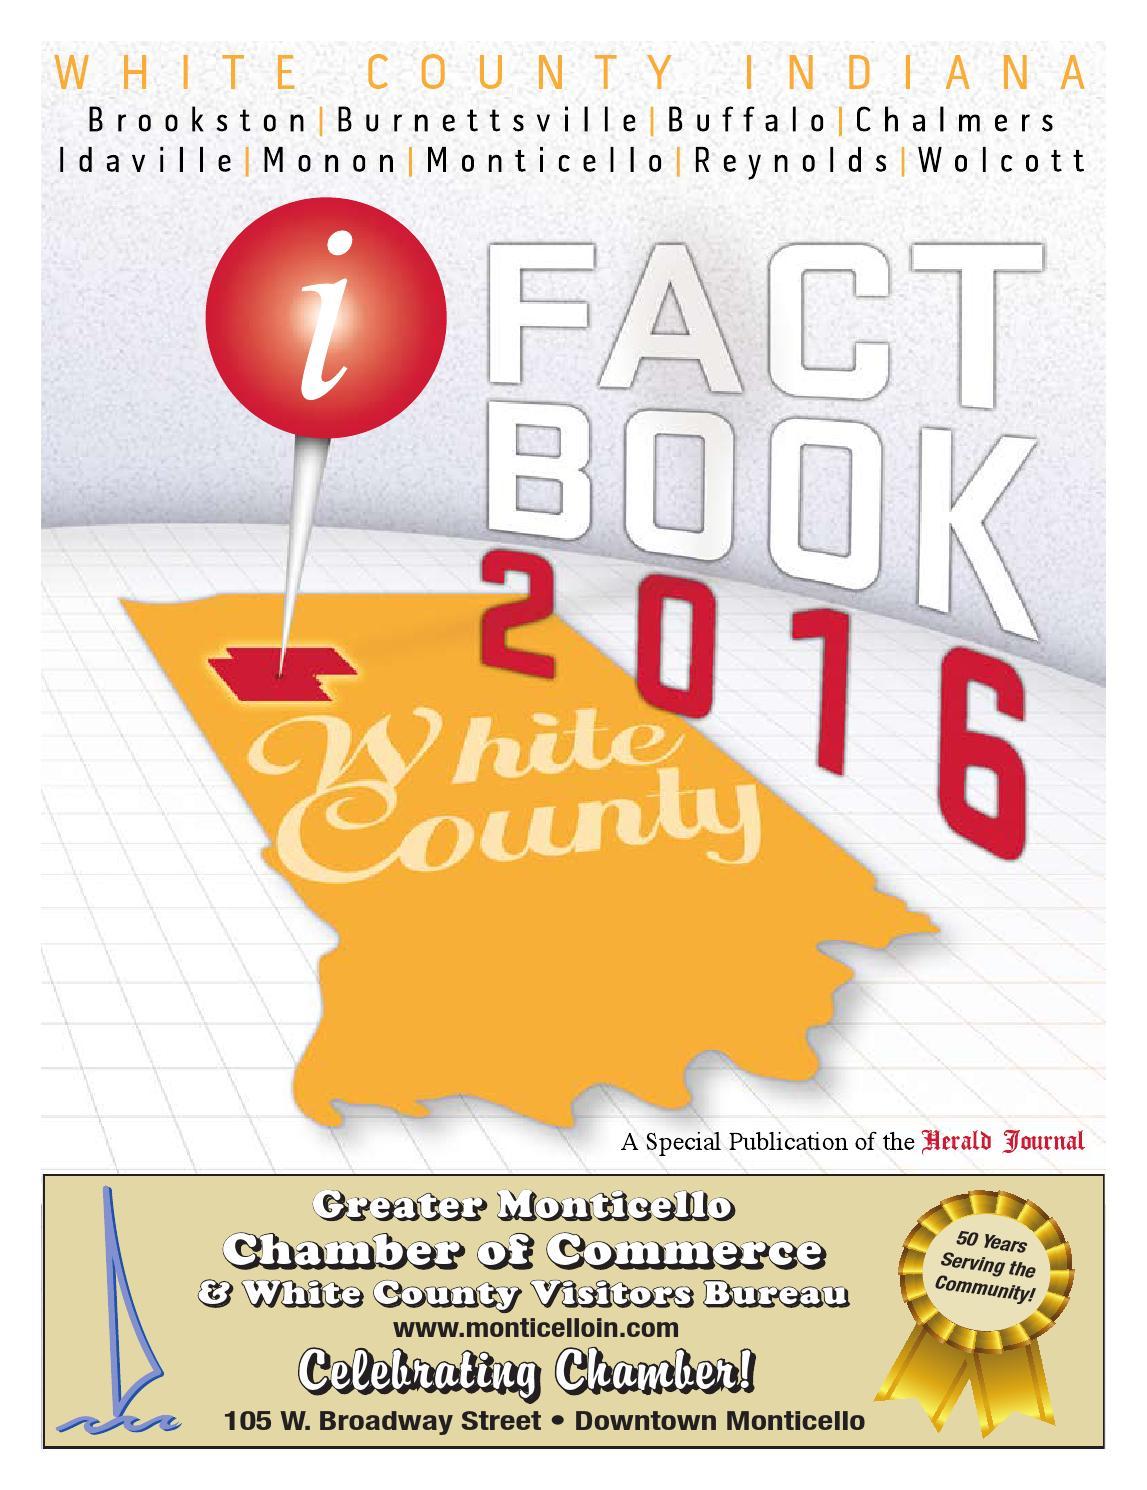 Indiana white county idaville - Indiana White County Idaville 16